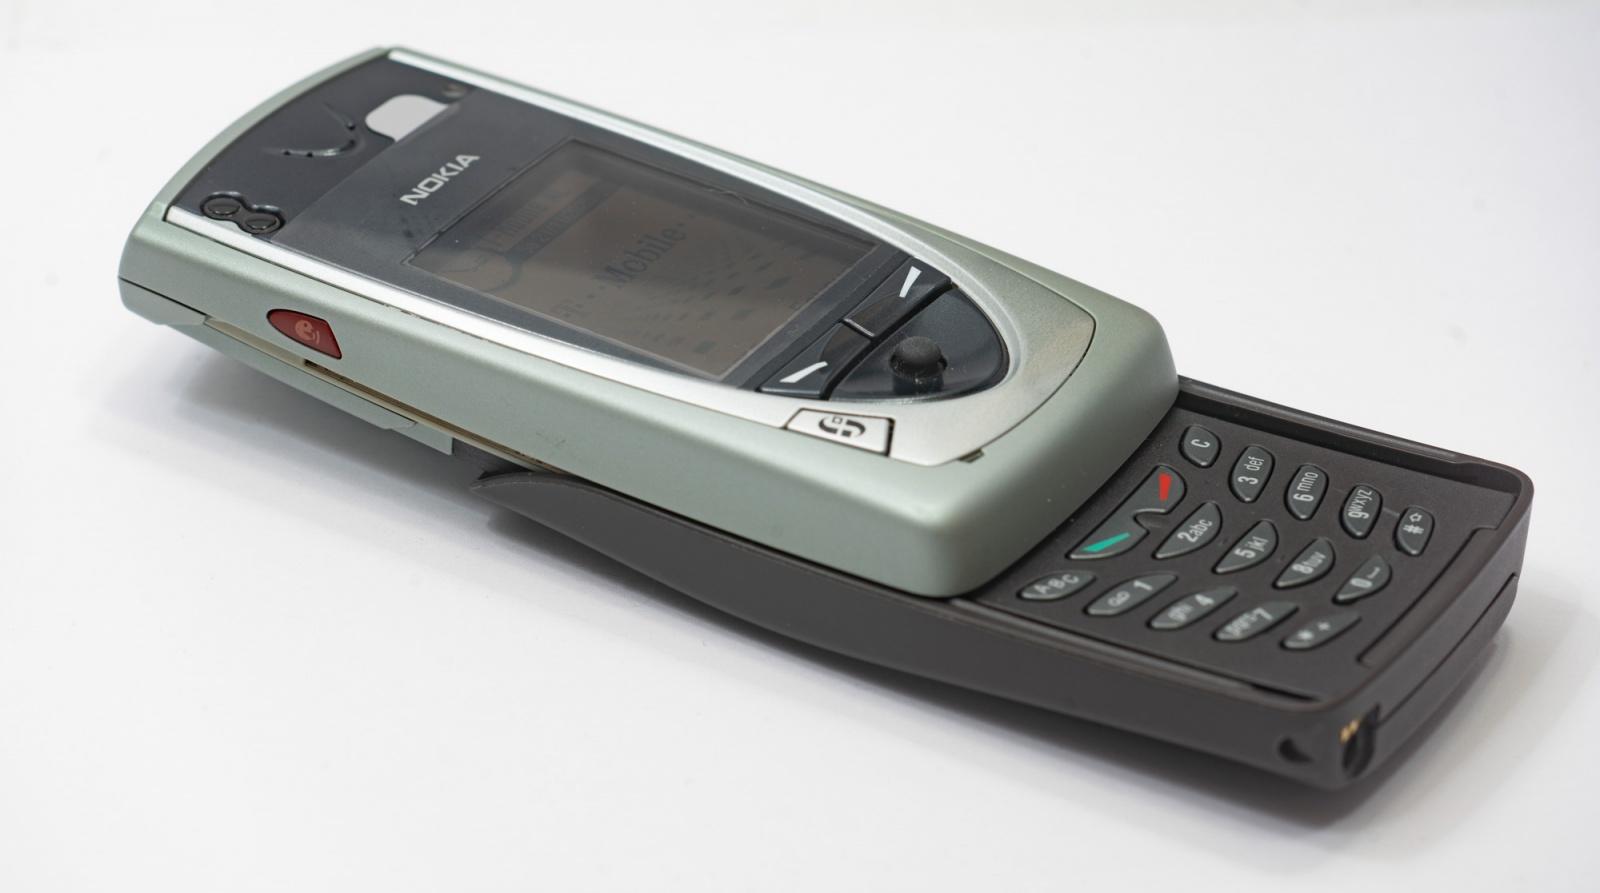 Nokia 7650 и начало эпохи смартфонов - 14